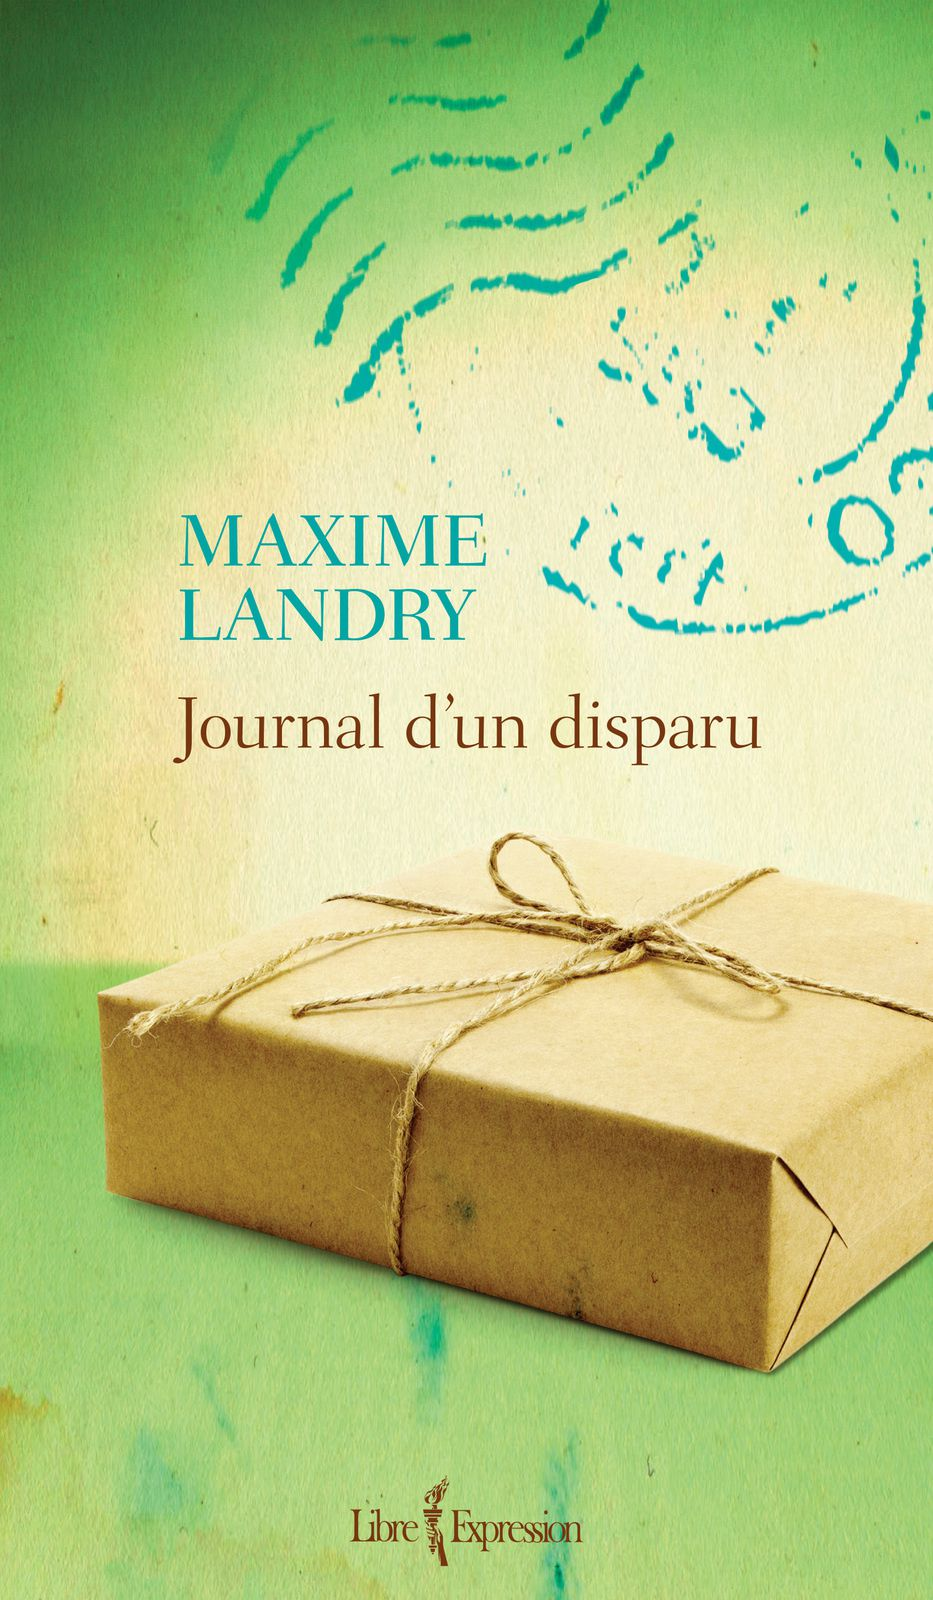 Citation de Maxime Landry